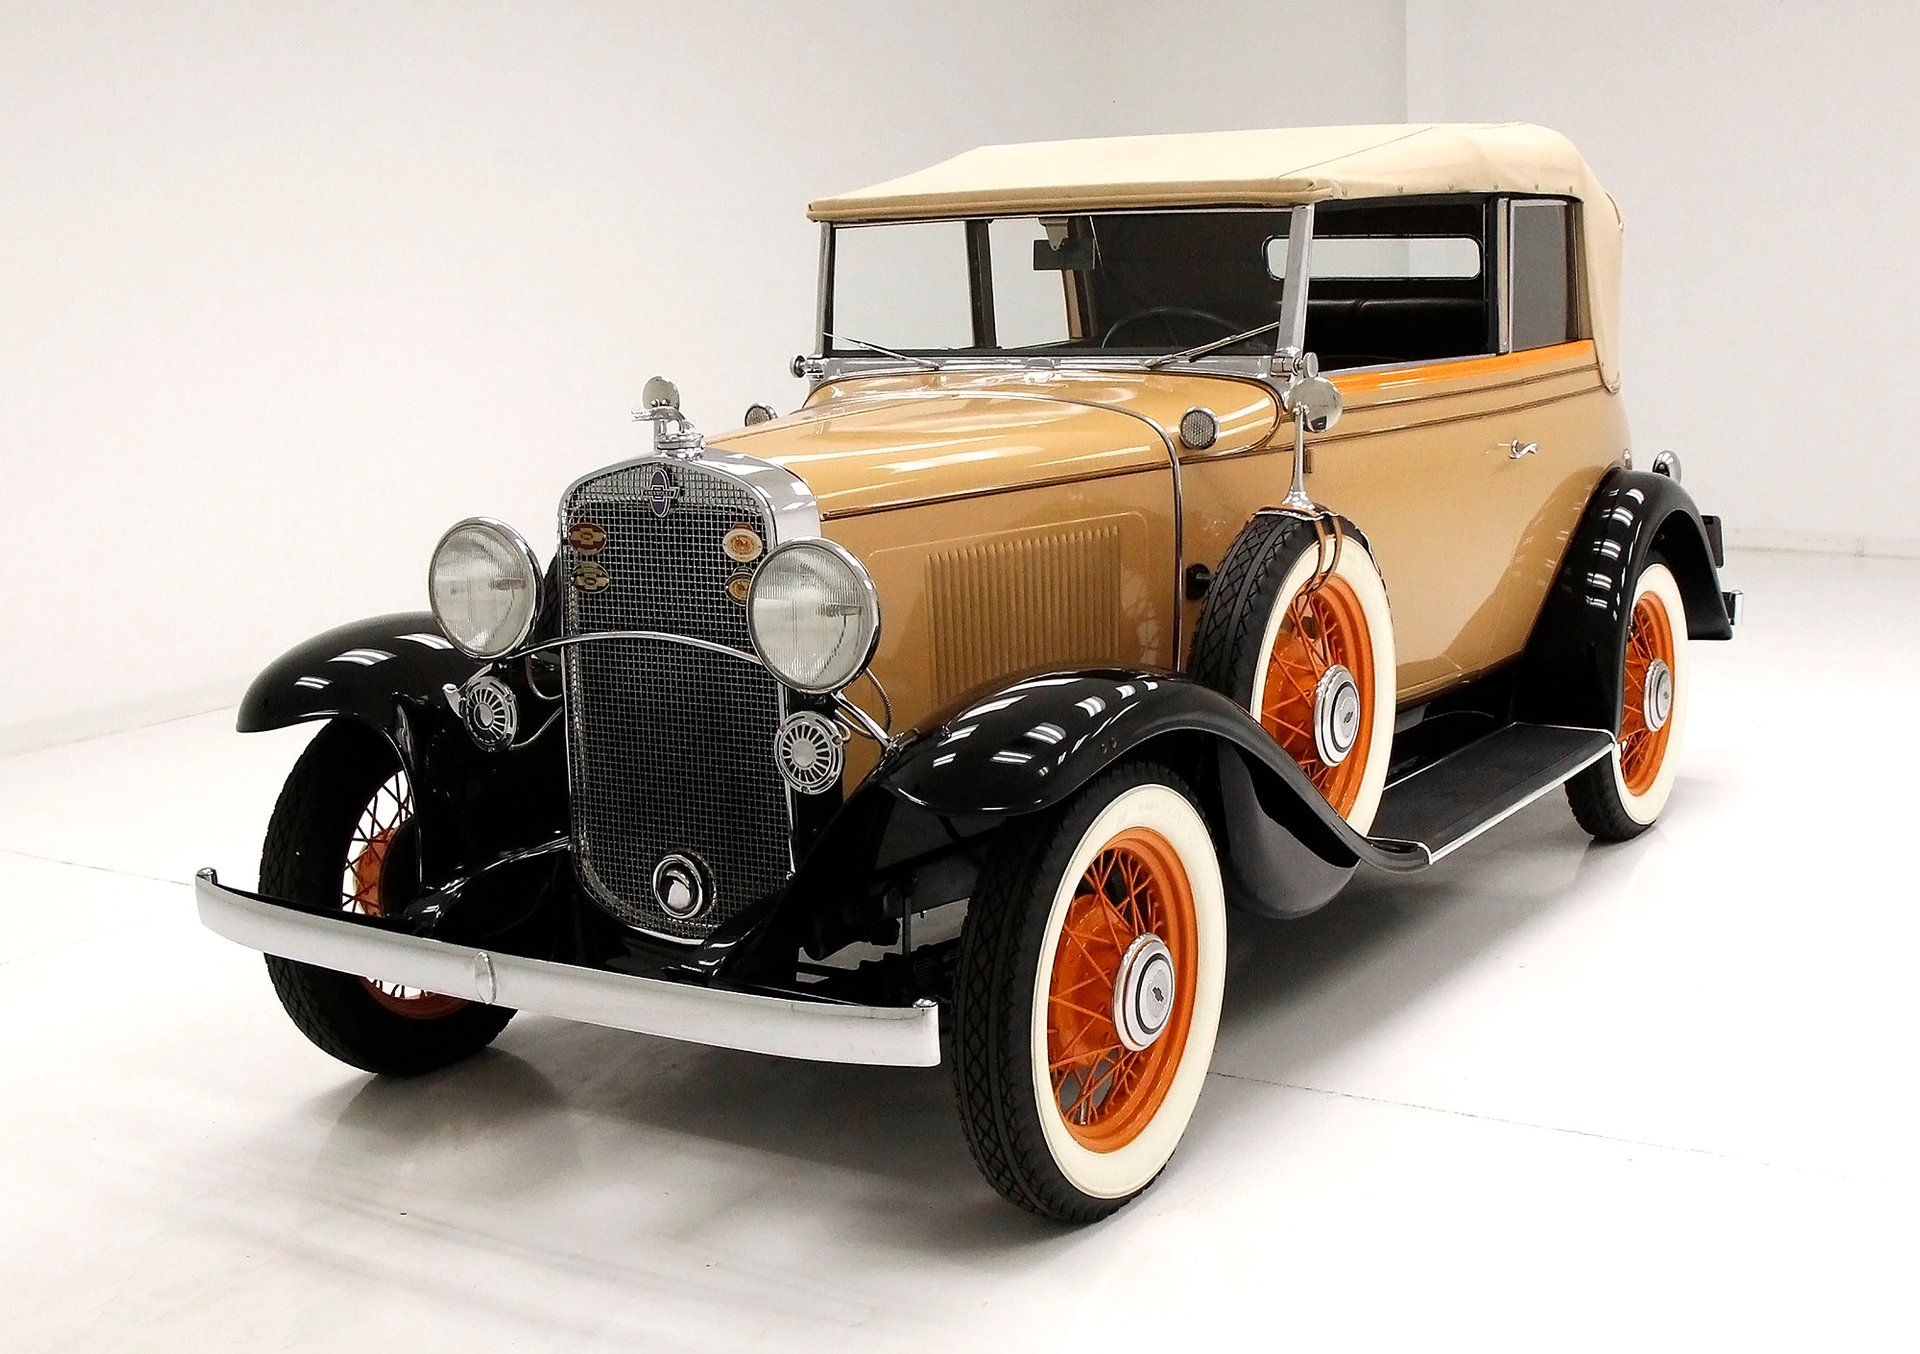 1931 Chevrolet Landau